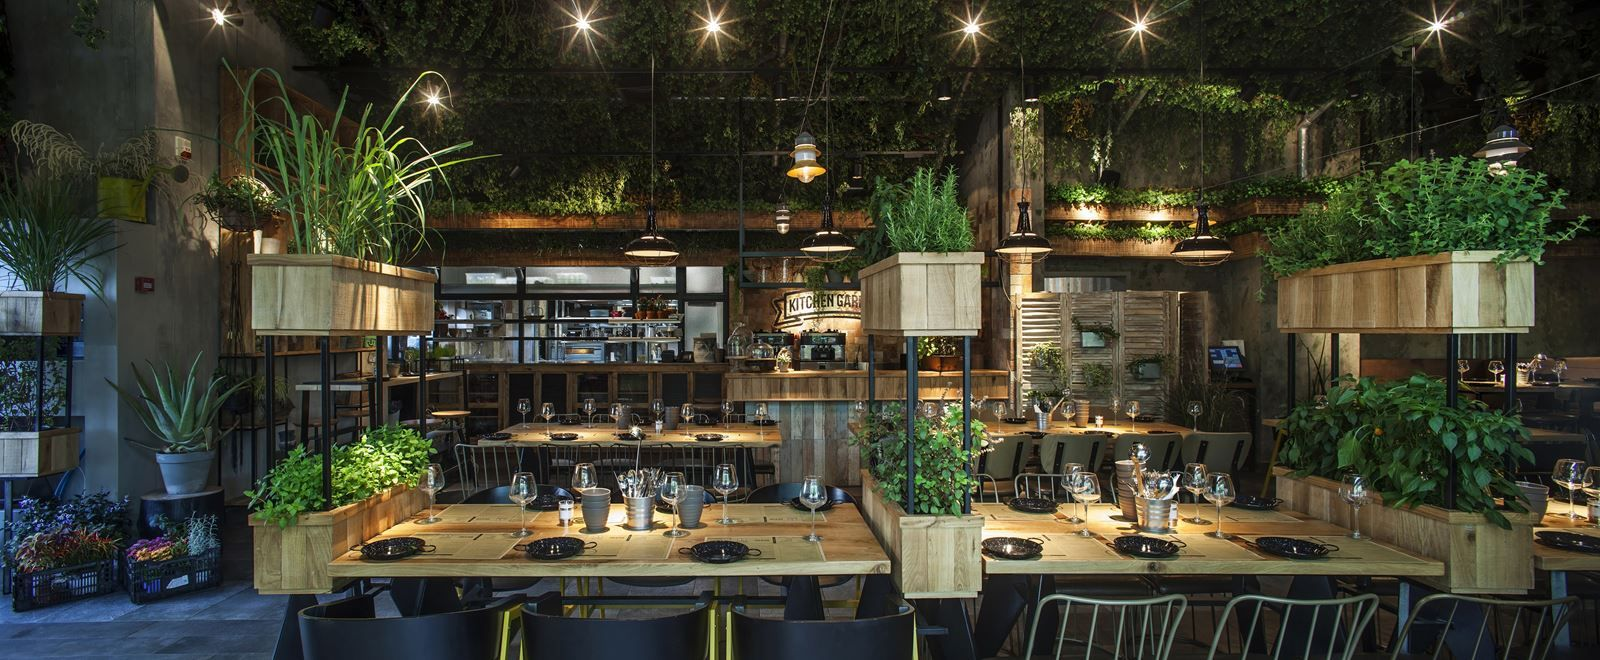 A Natural Restaurant Interior Design Adorable Home Restaurant Interior Restaurant Interior Design Restaurant Design